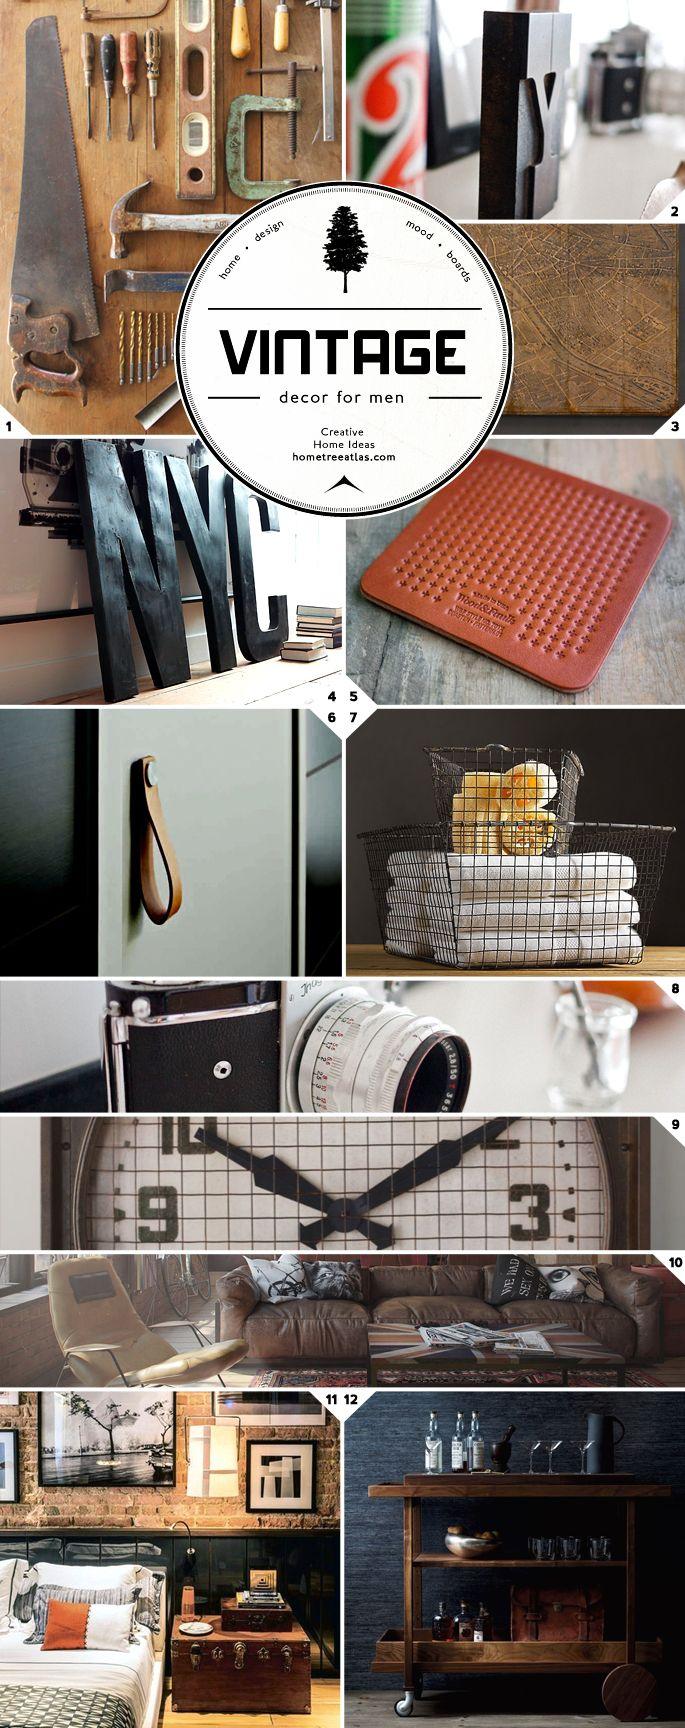 Vintage decor ideas for men new apartment pinterest hogar